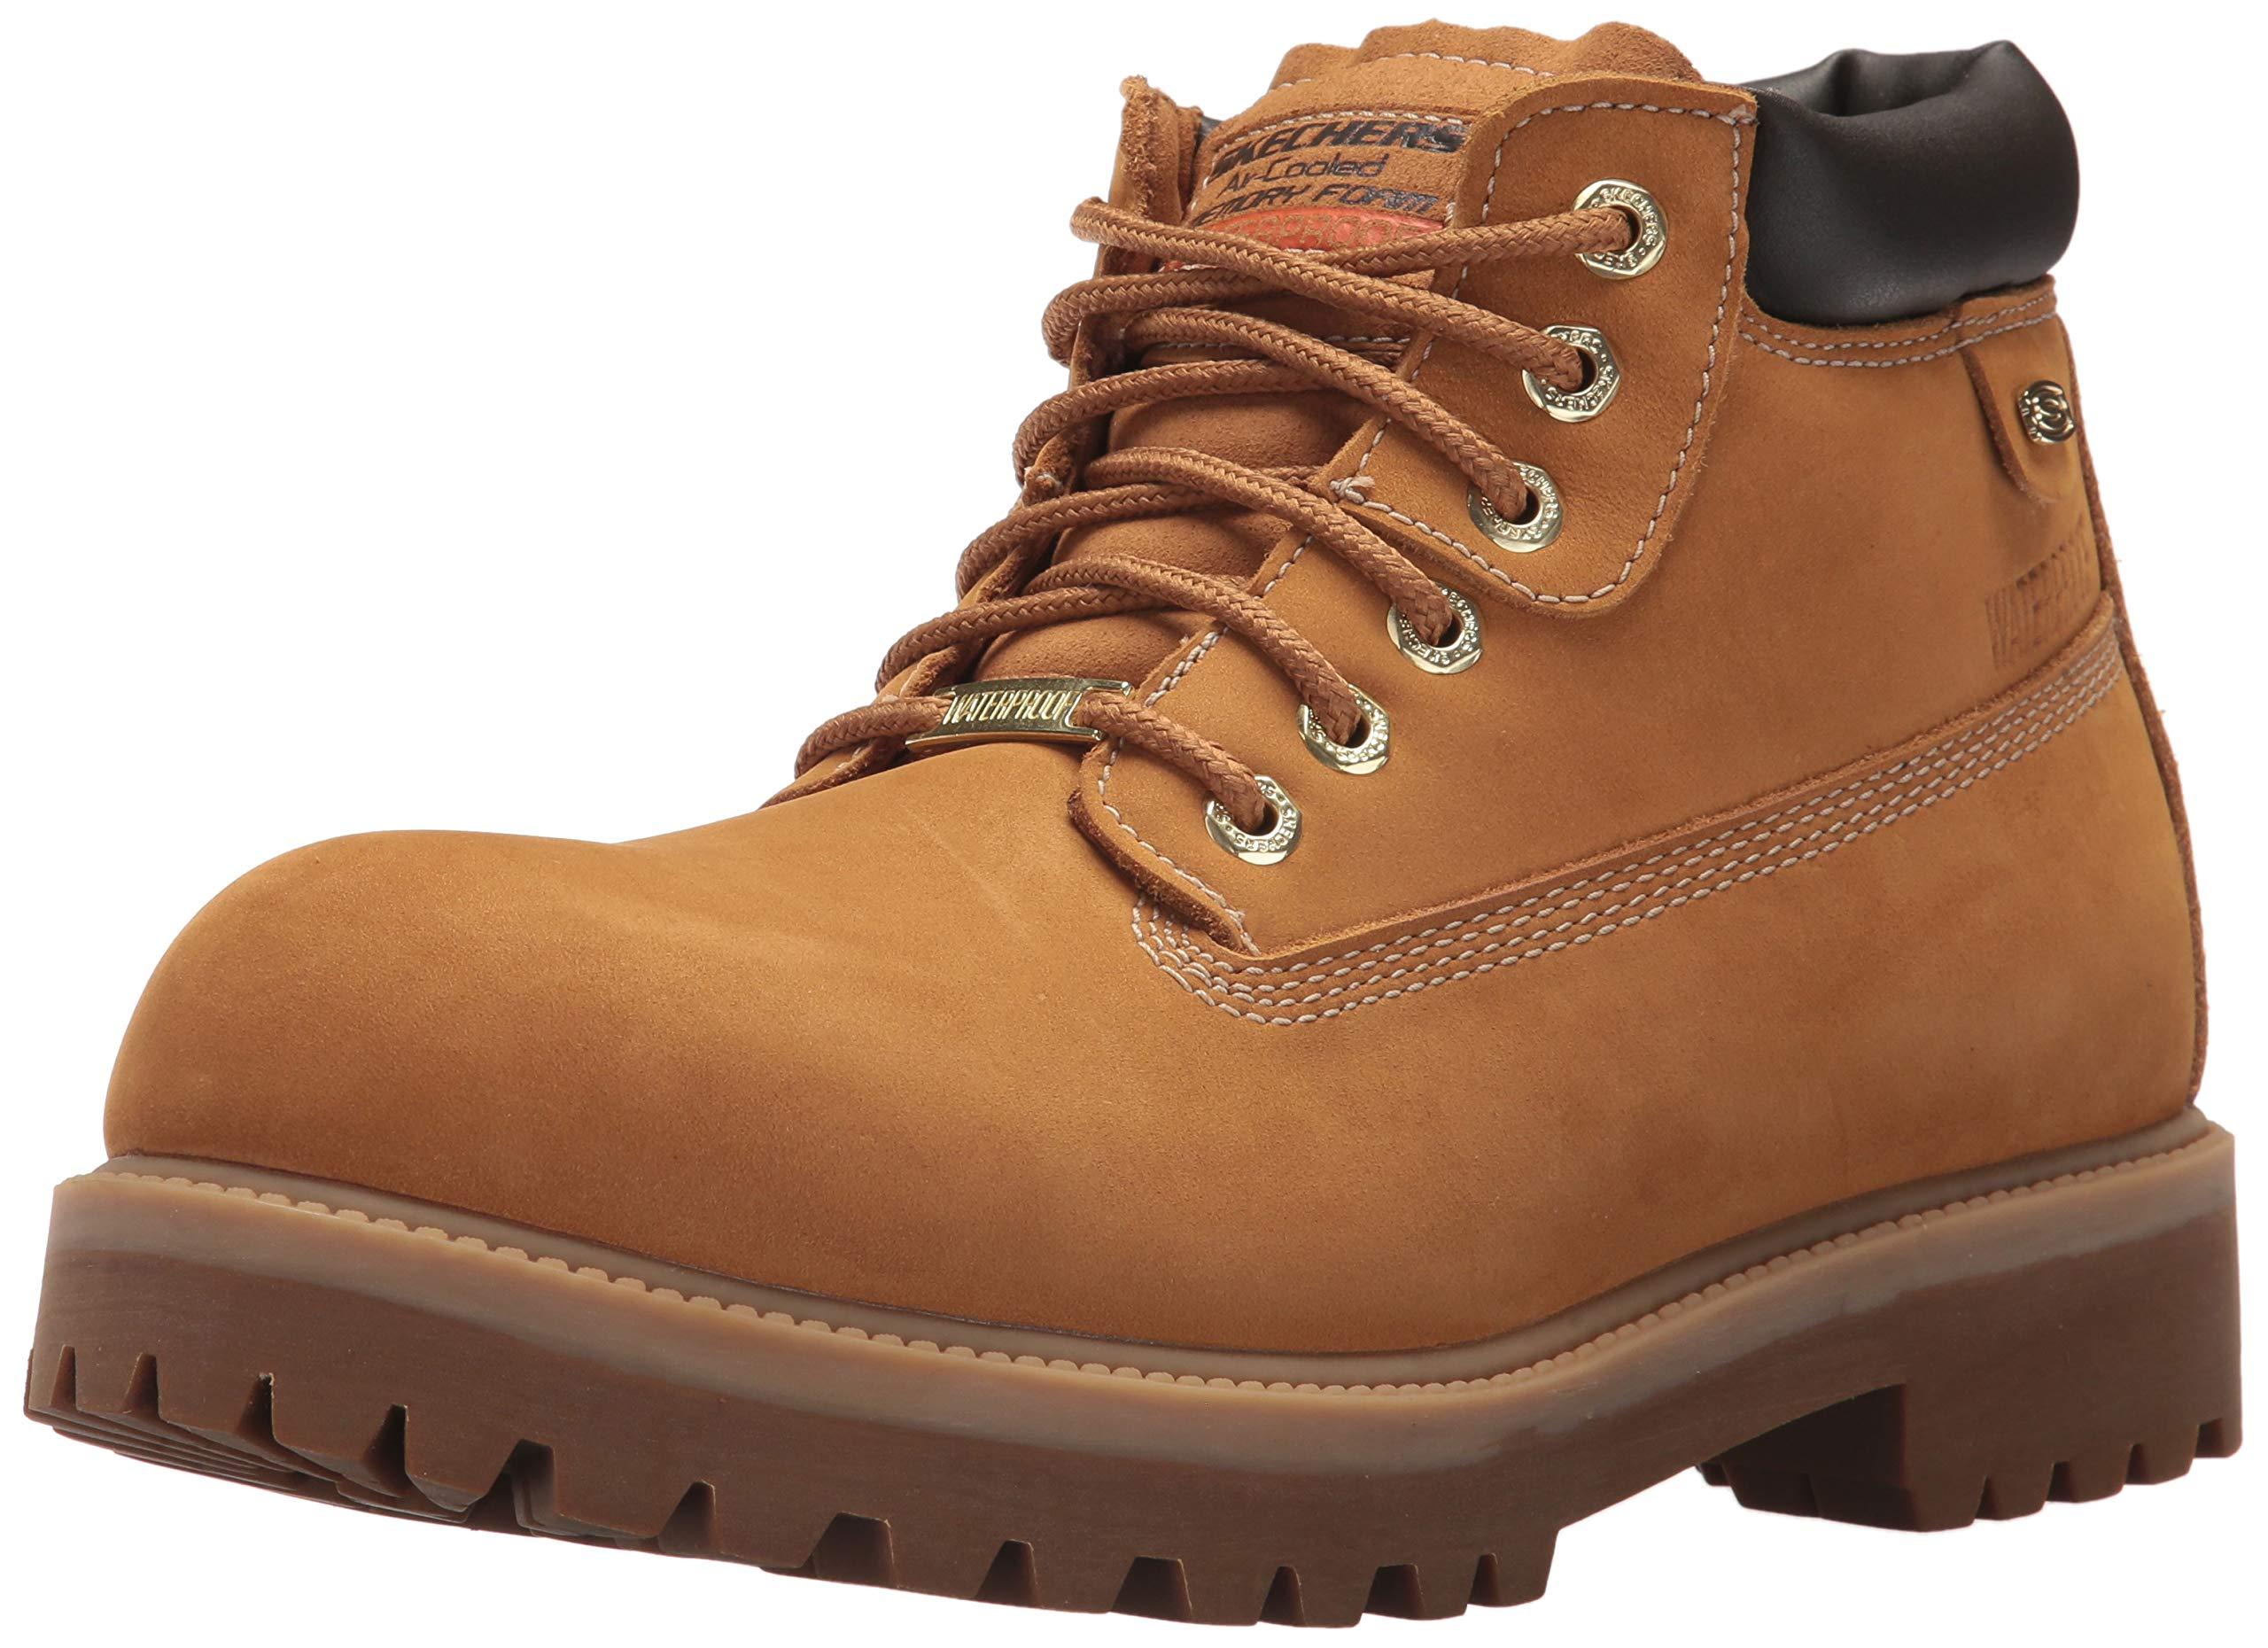 Skechers Men's Sergeants-Verdict Fashion Boot, WTG, 10.5 Medium US